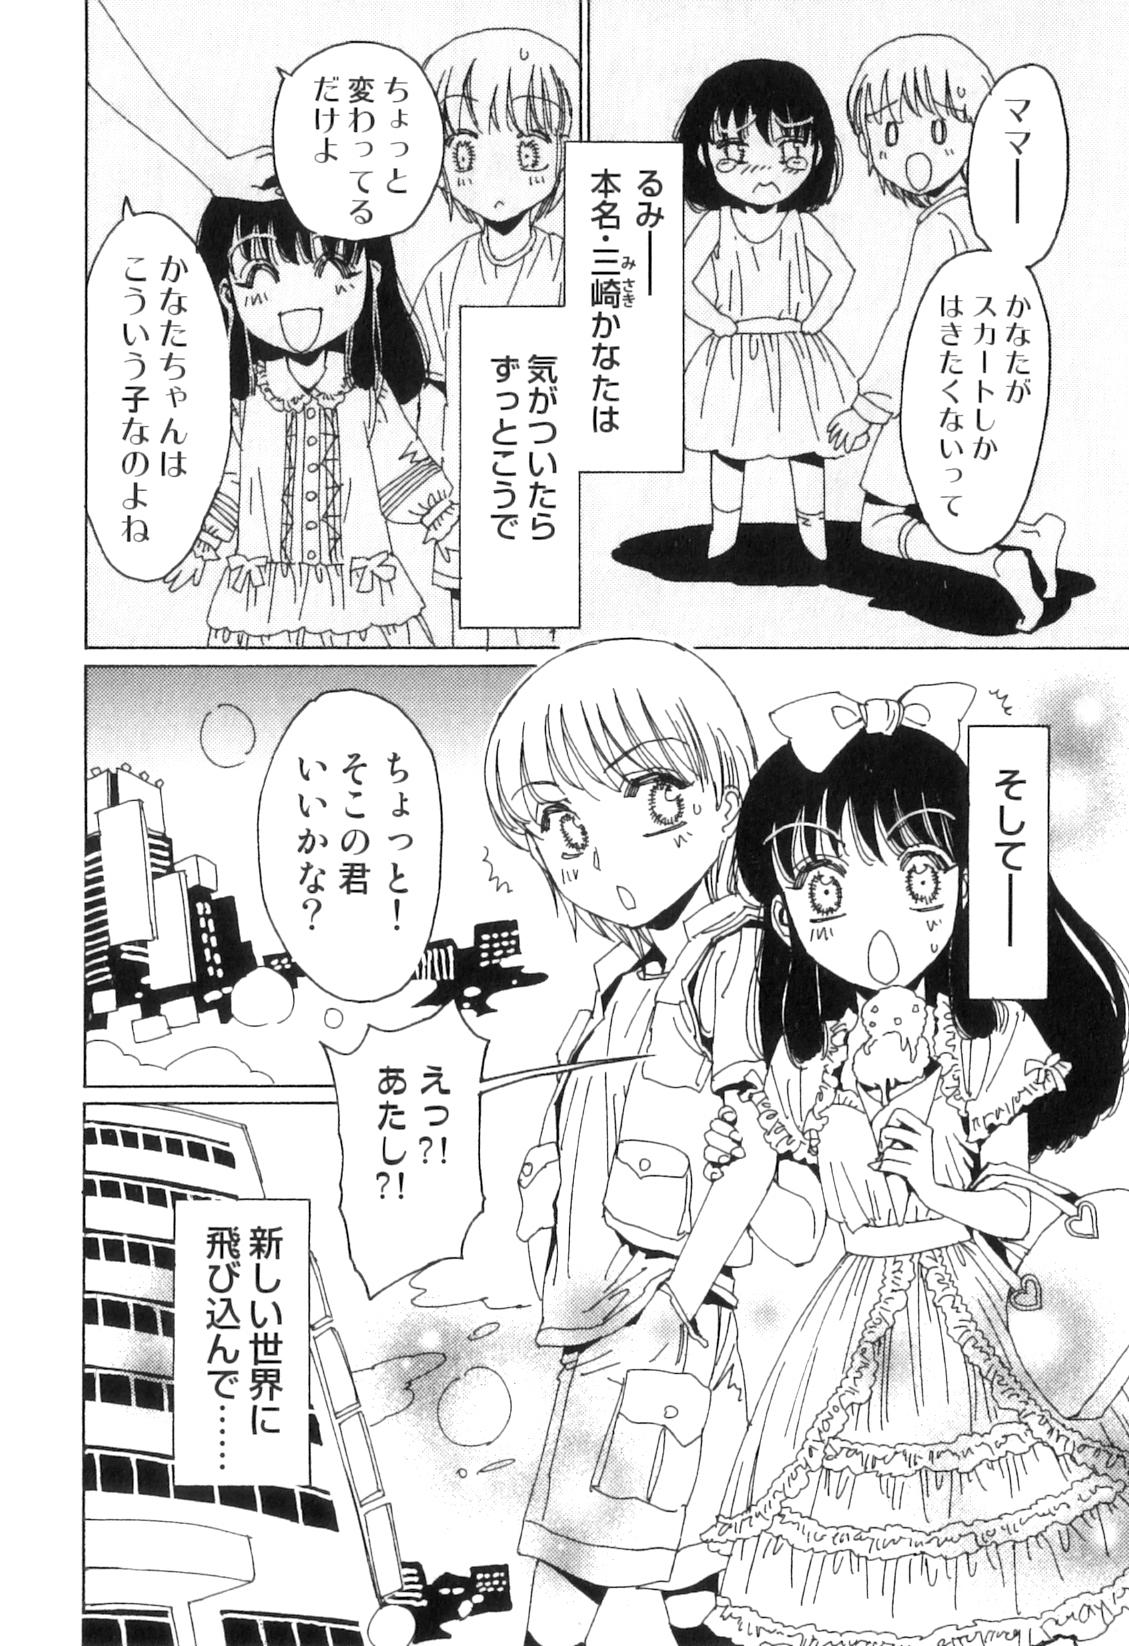 Yuni-Hapi 14